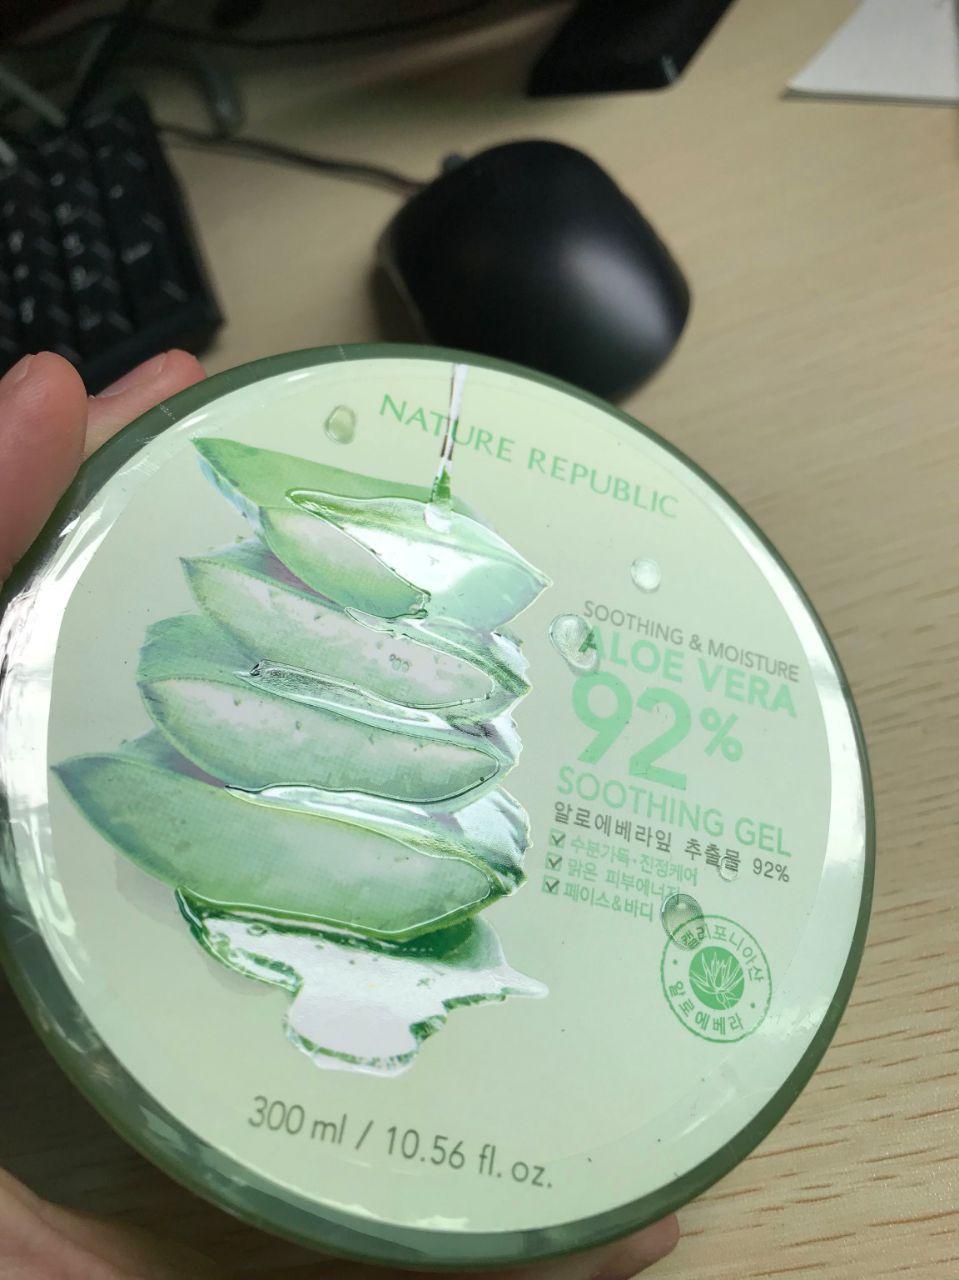 Kehebatan Aloevera Soothing Gel Asli Korea Aloe Vera Teknologi Kosmetik Nature Republik Ori Republic 300 Ml Best Price